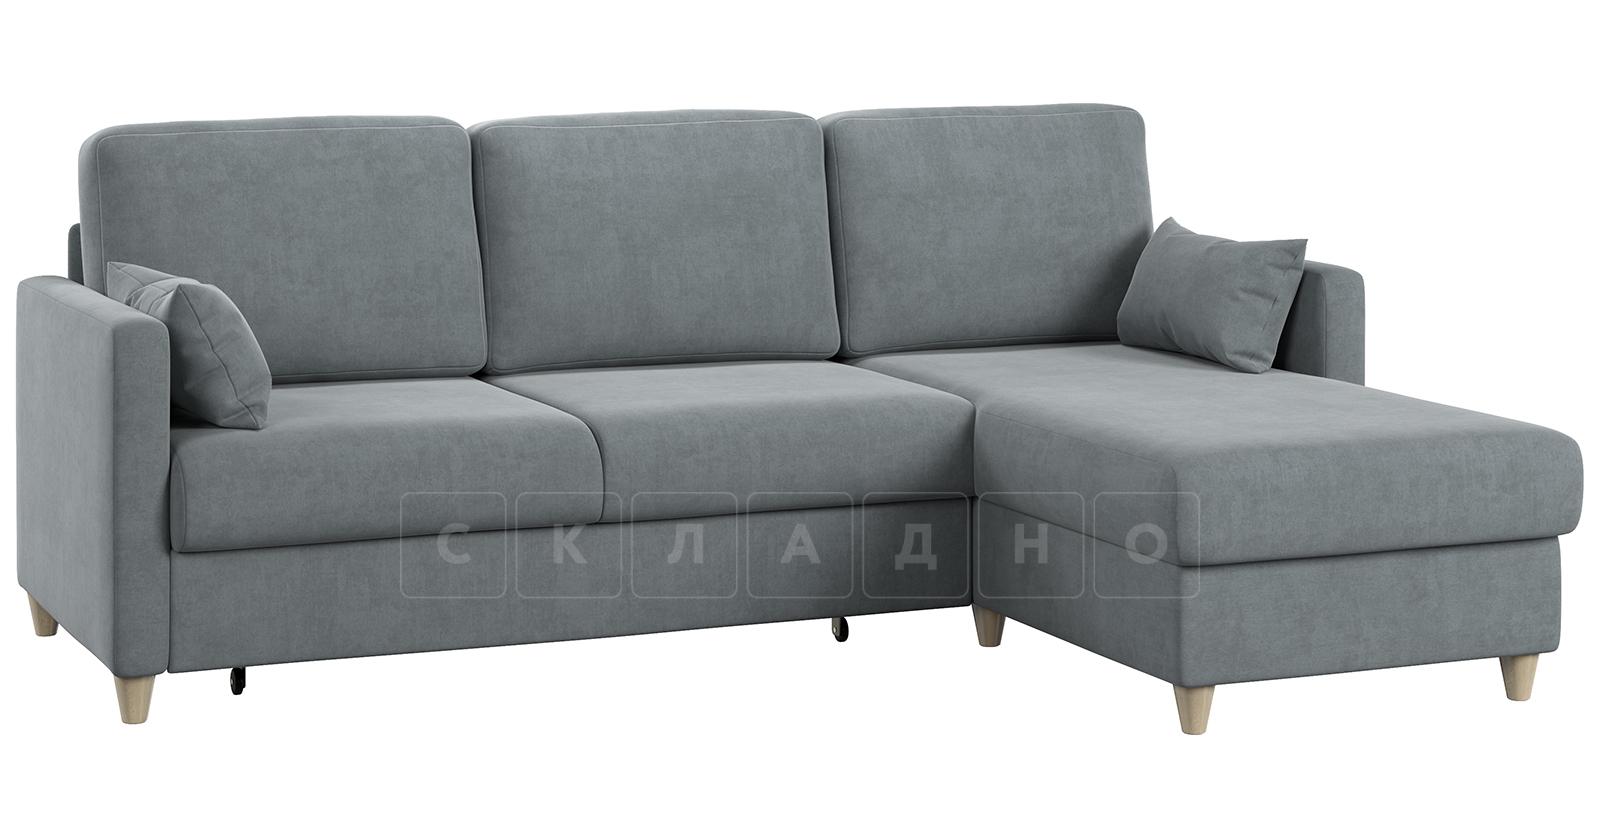 Угловой диван Дарвин серый фото 16 | интернет-магазин Складно